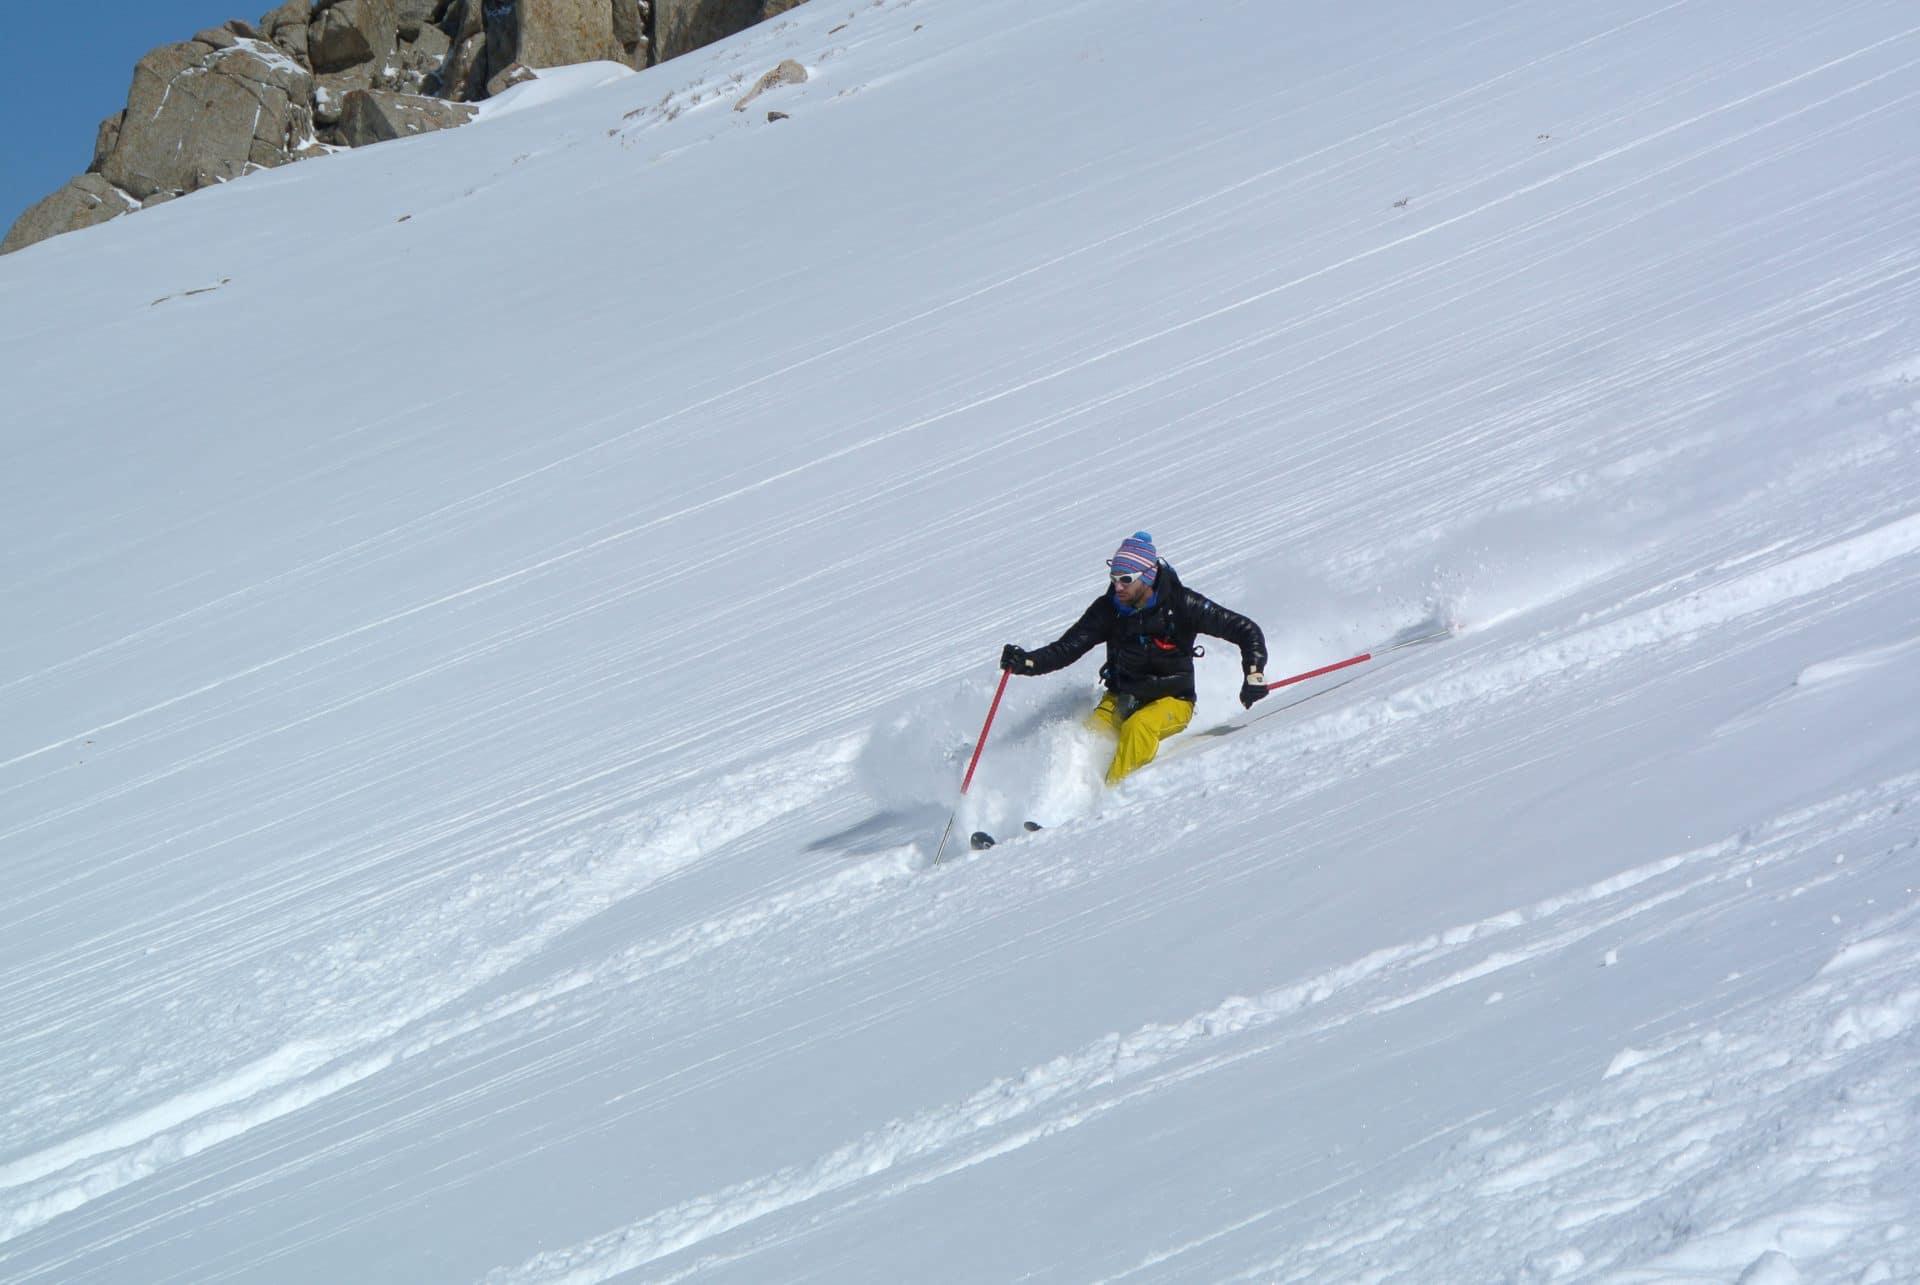 Helyum_Xavier-Carrard_Guide-de-montagne_Ski_Voyage_Kirghistan_Asie-Centrale_Lilian-Martinez_Ski-libre